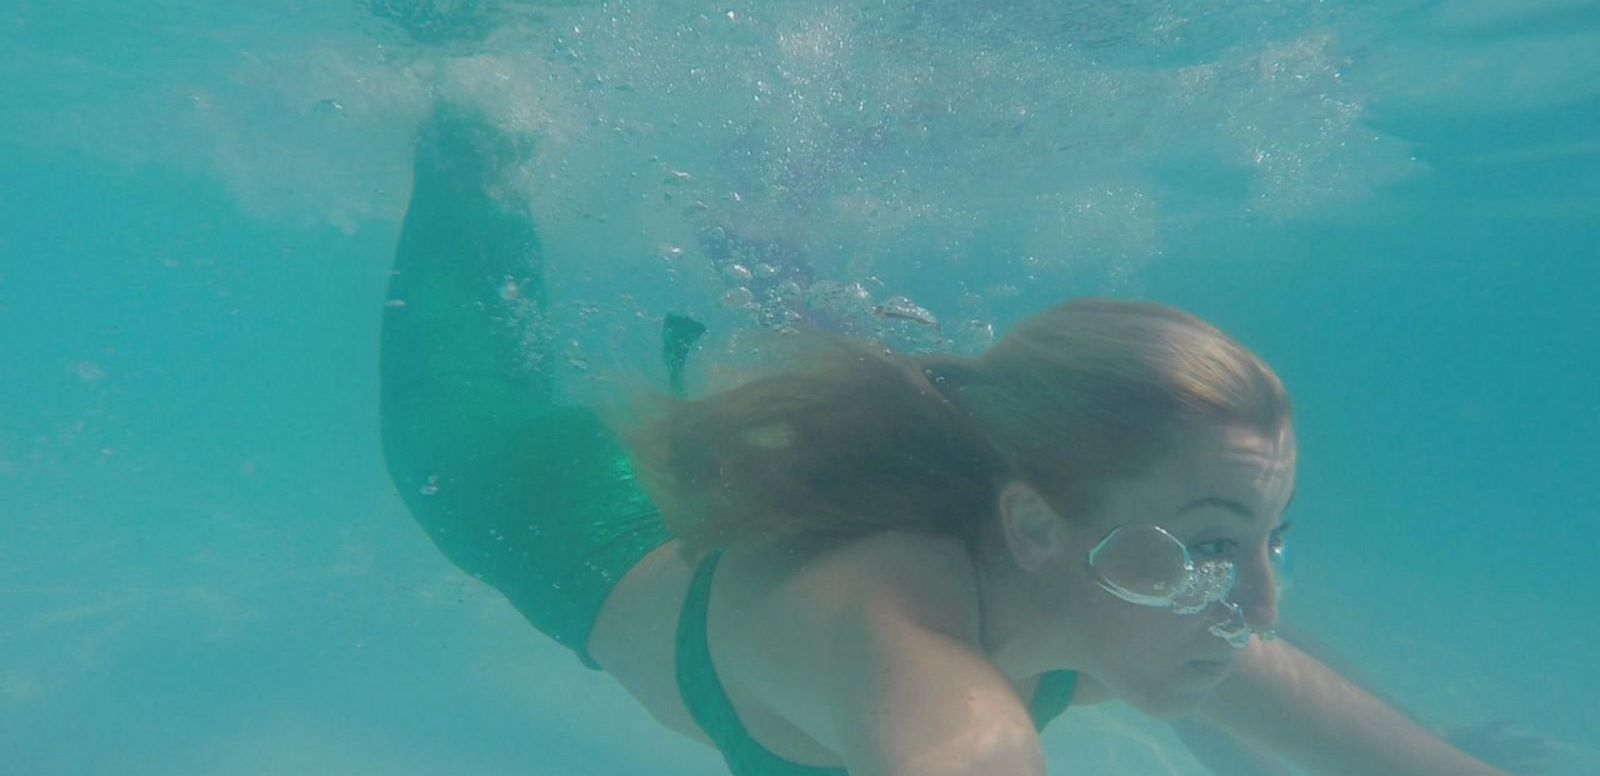 VIDEO: New Mermaid Fitness Class Transforms Women